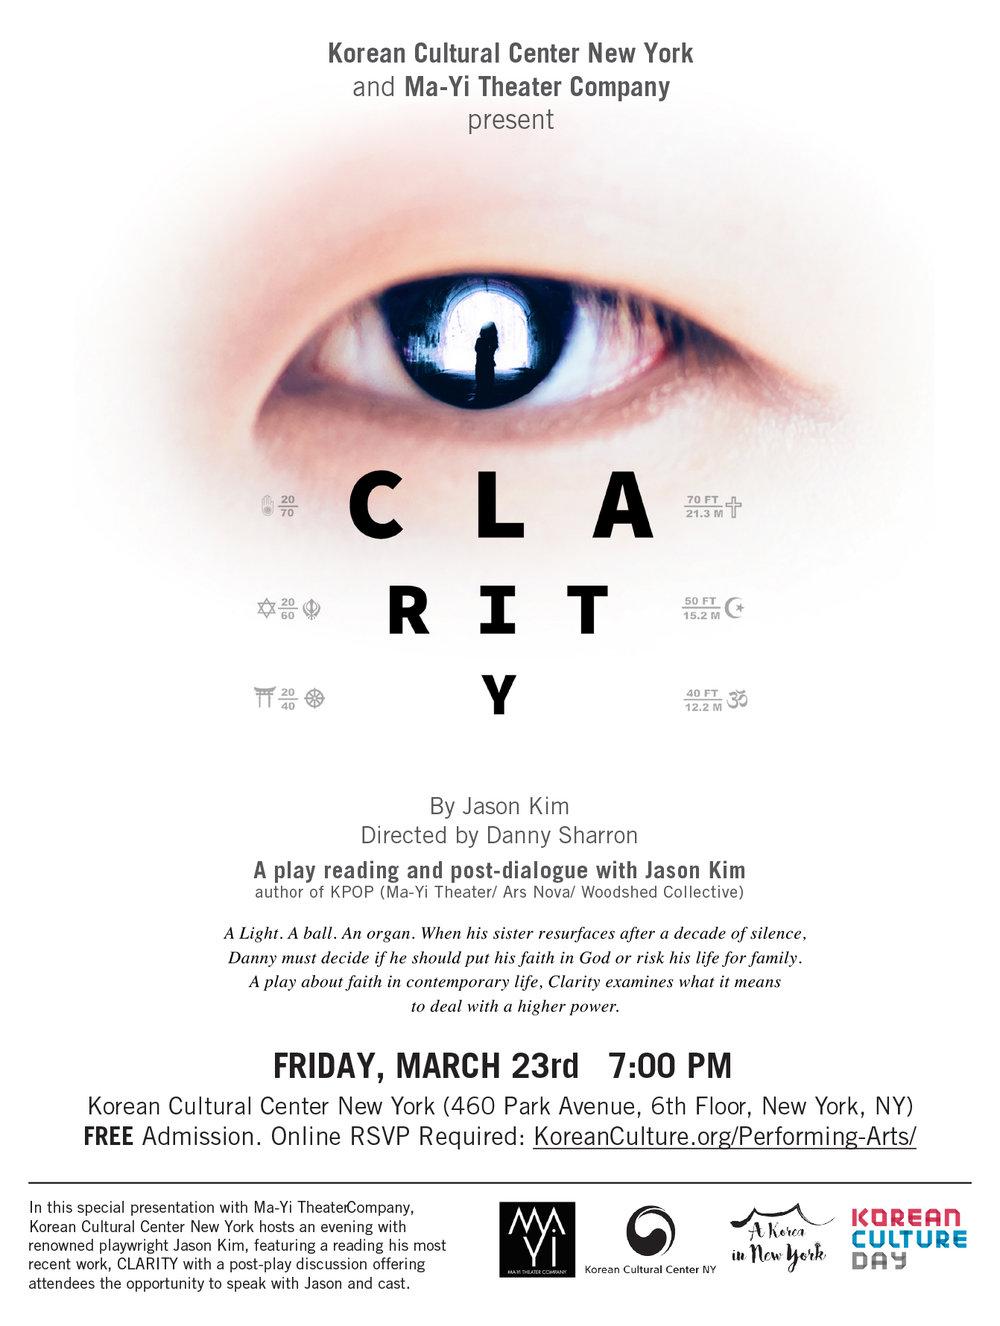 Clarity_Poster-0323-FINAL-(1).jpg